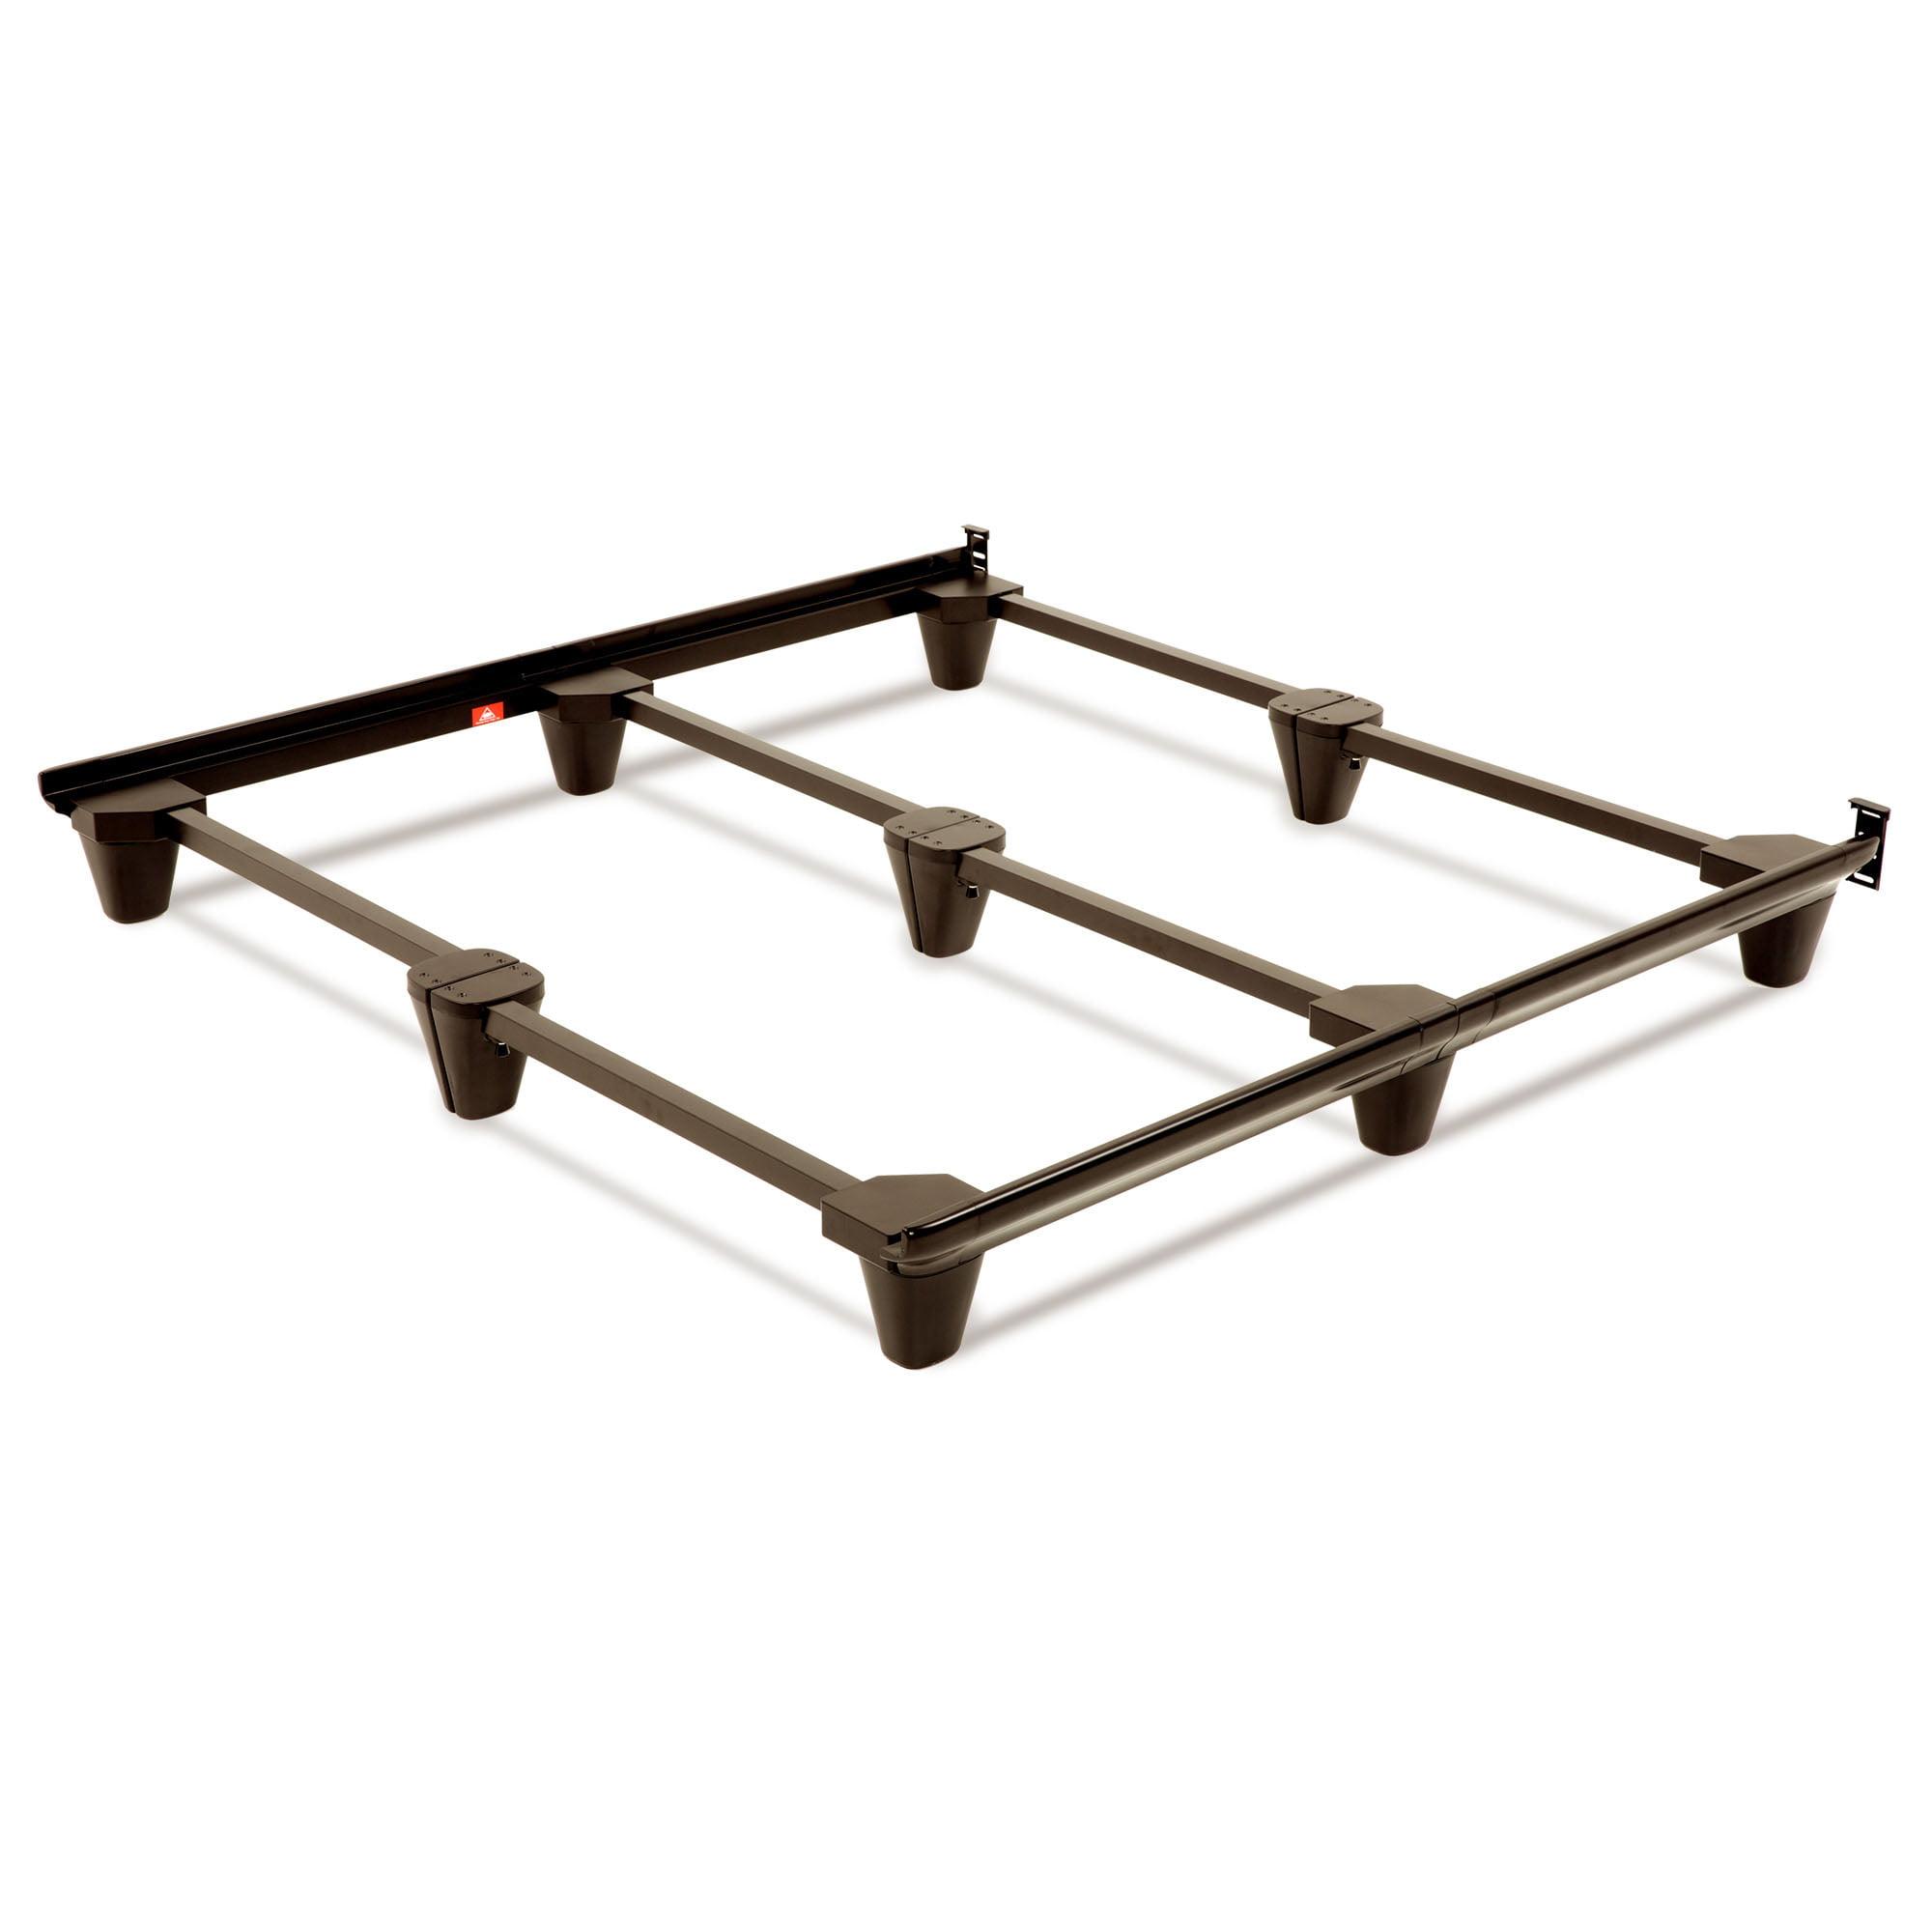 Presto Adjustable Bed Frame with Headboard Brackets California King Mahogany - Fashion Bed Group